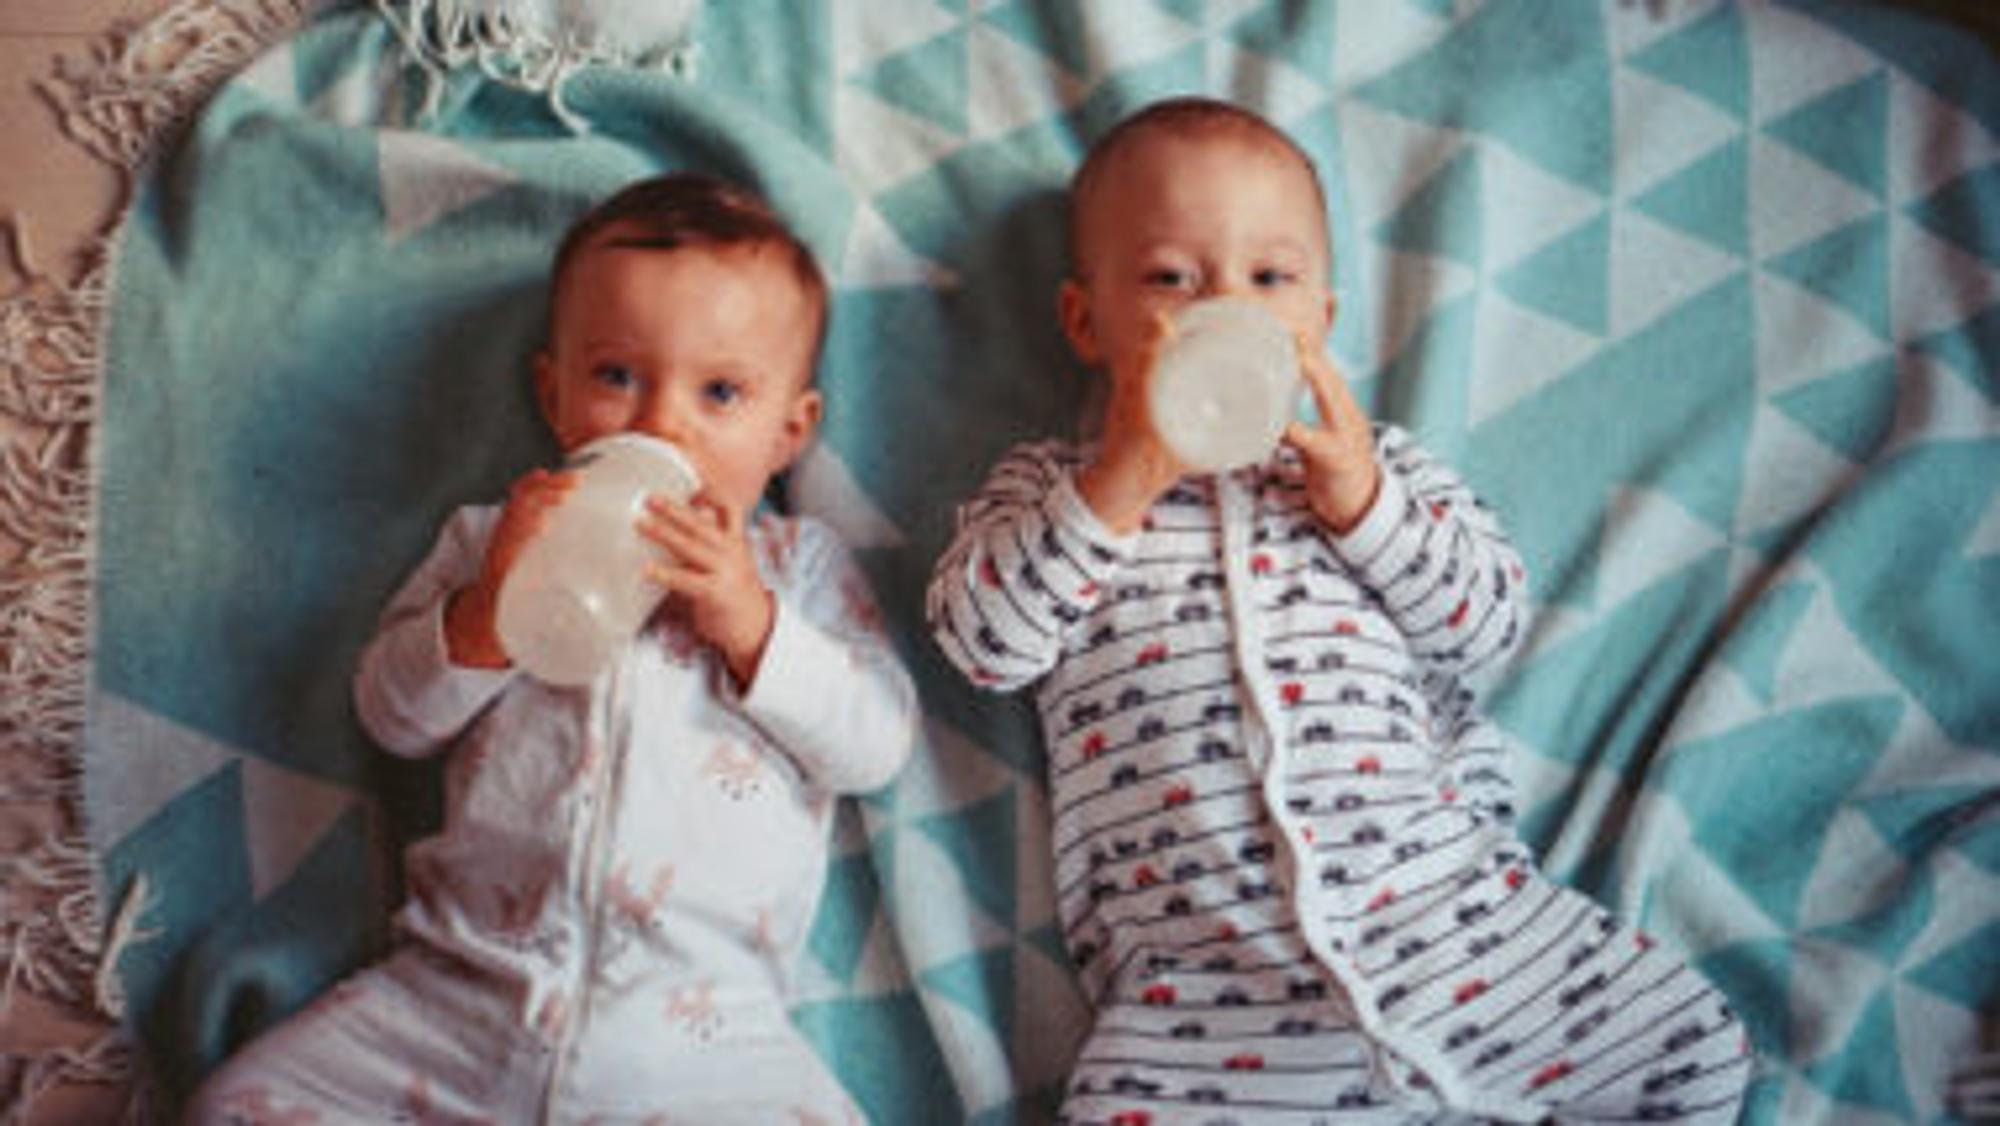 Trinkmenge Baby: Zwei babys trinken